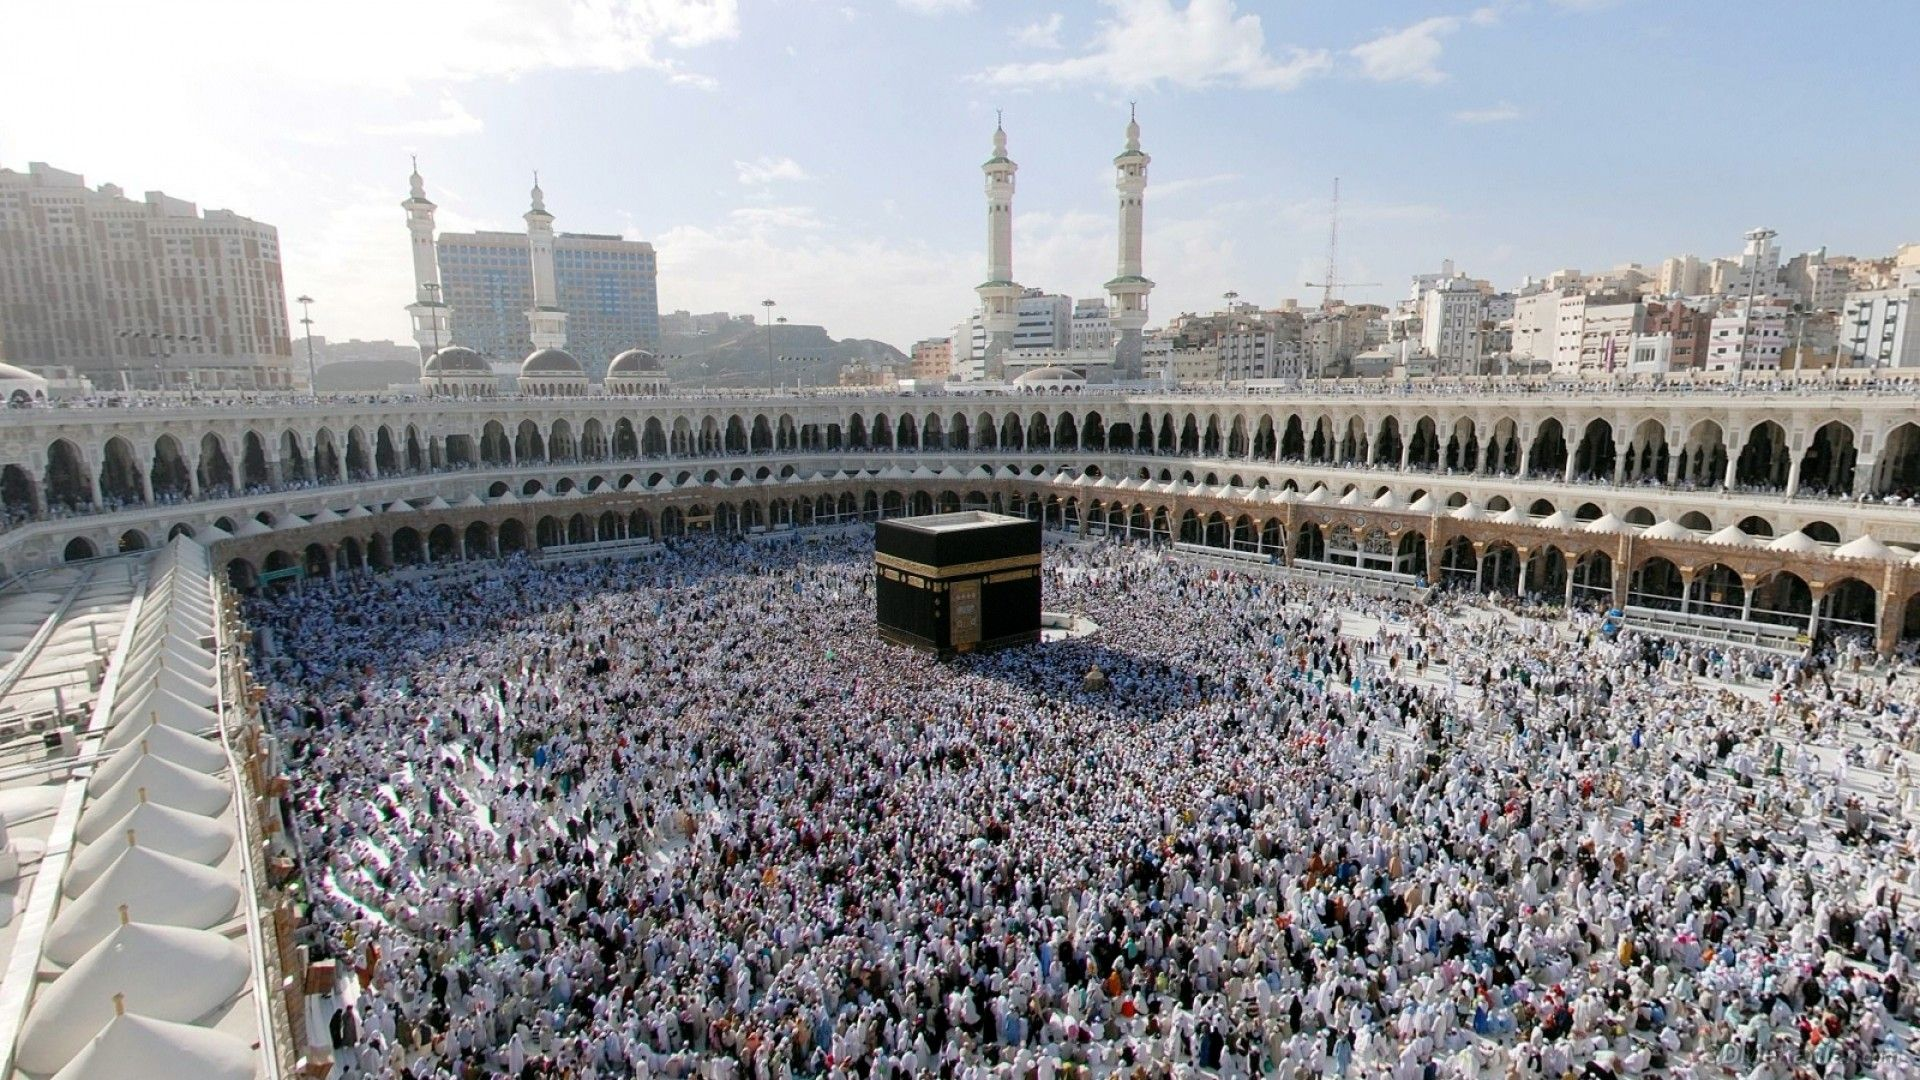 1920x1080 Full HD Wallpaper kaaba mecca mosque wonder Desktop 1920x1080